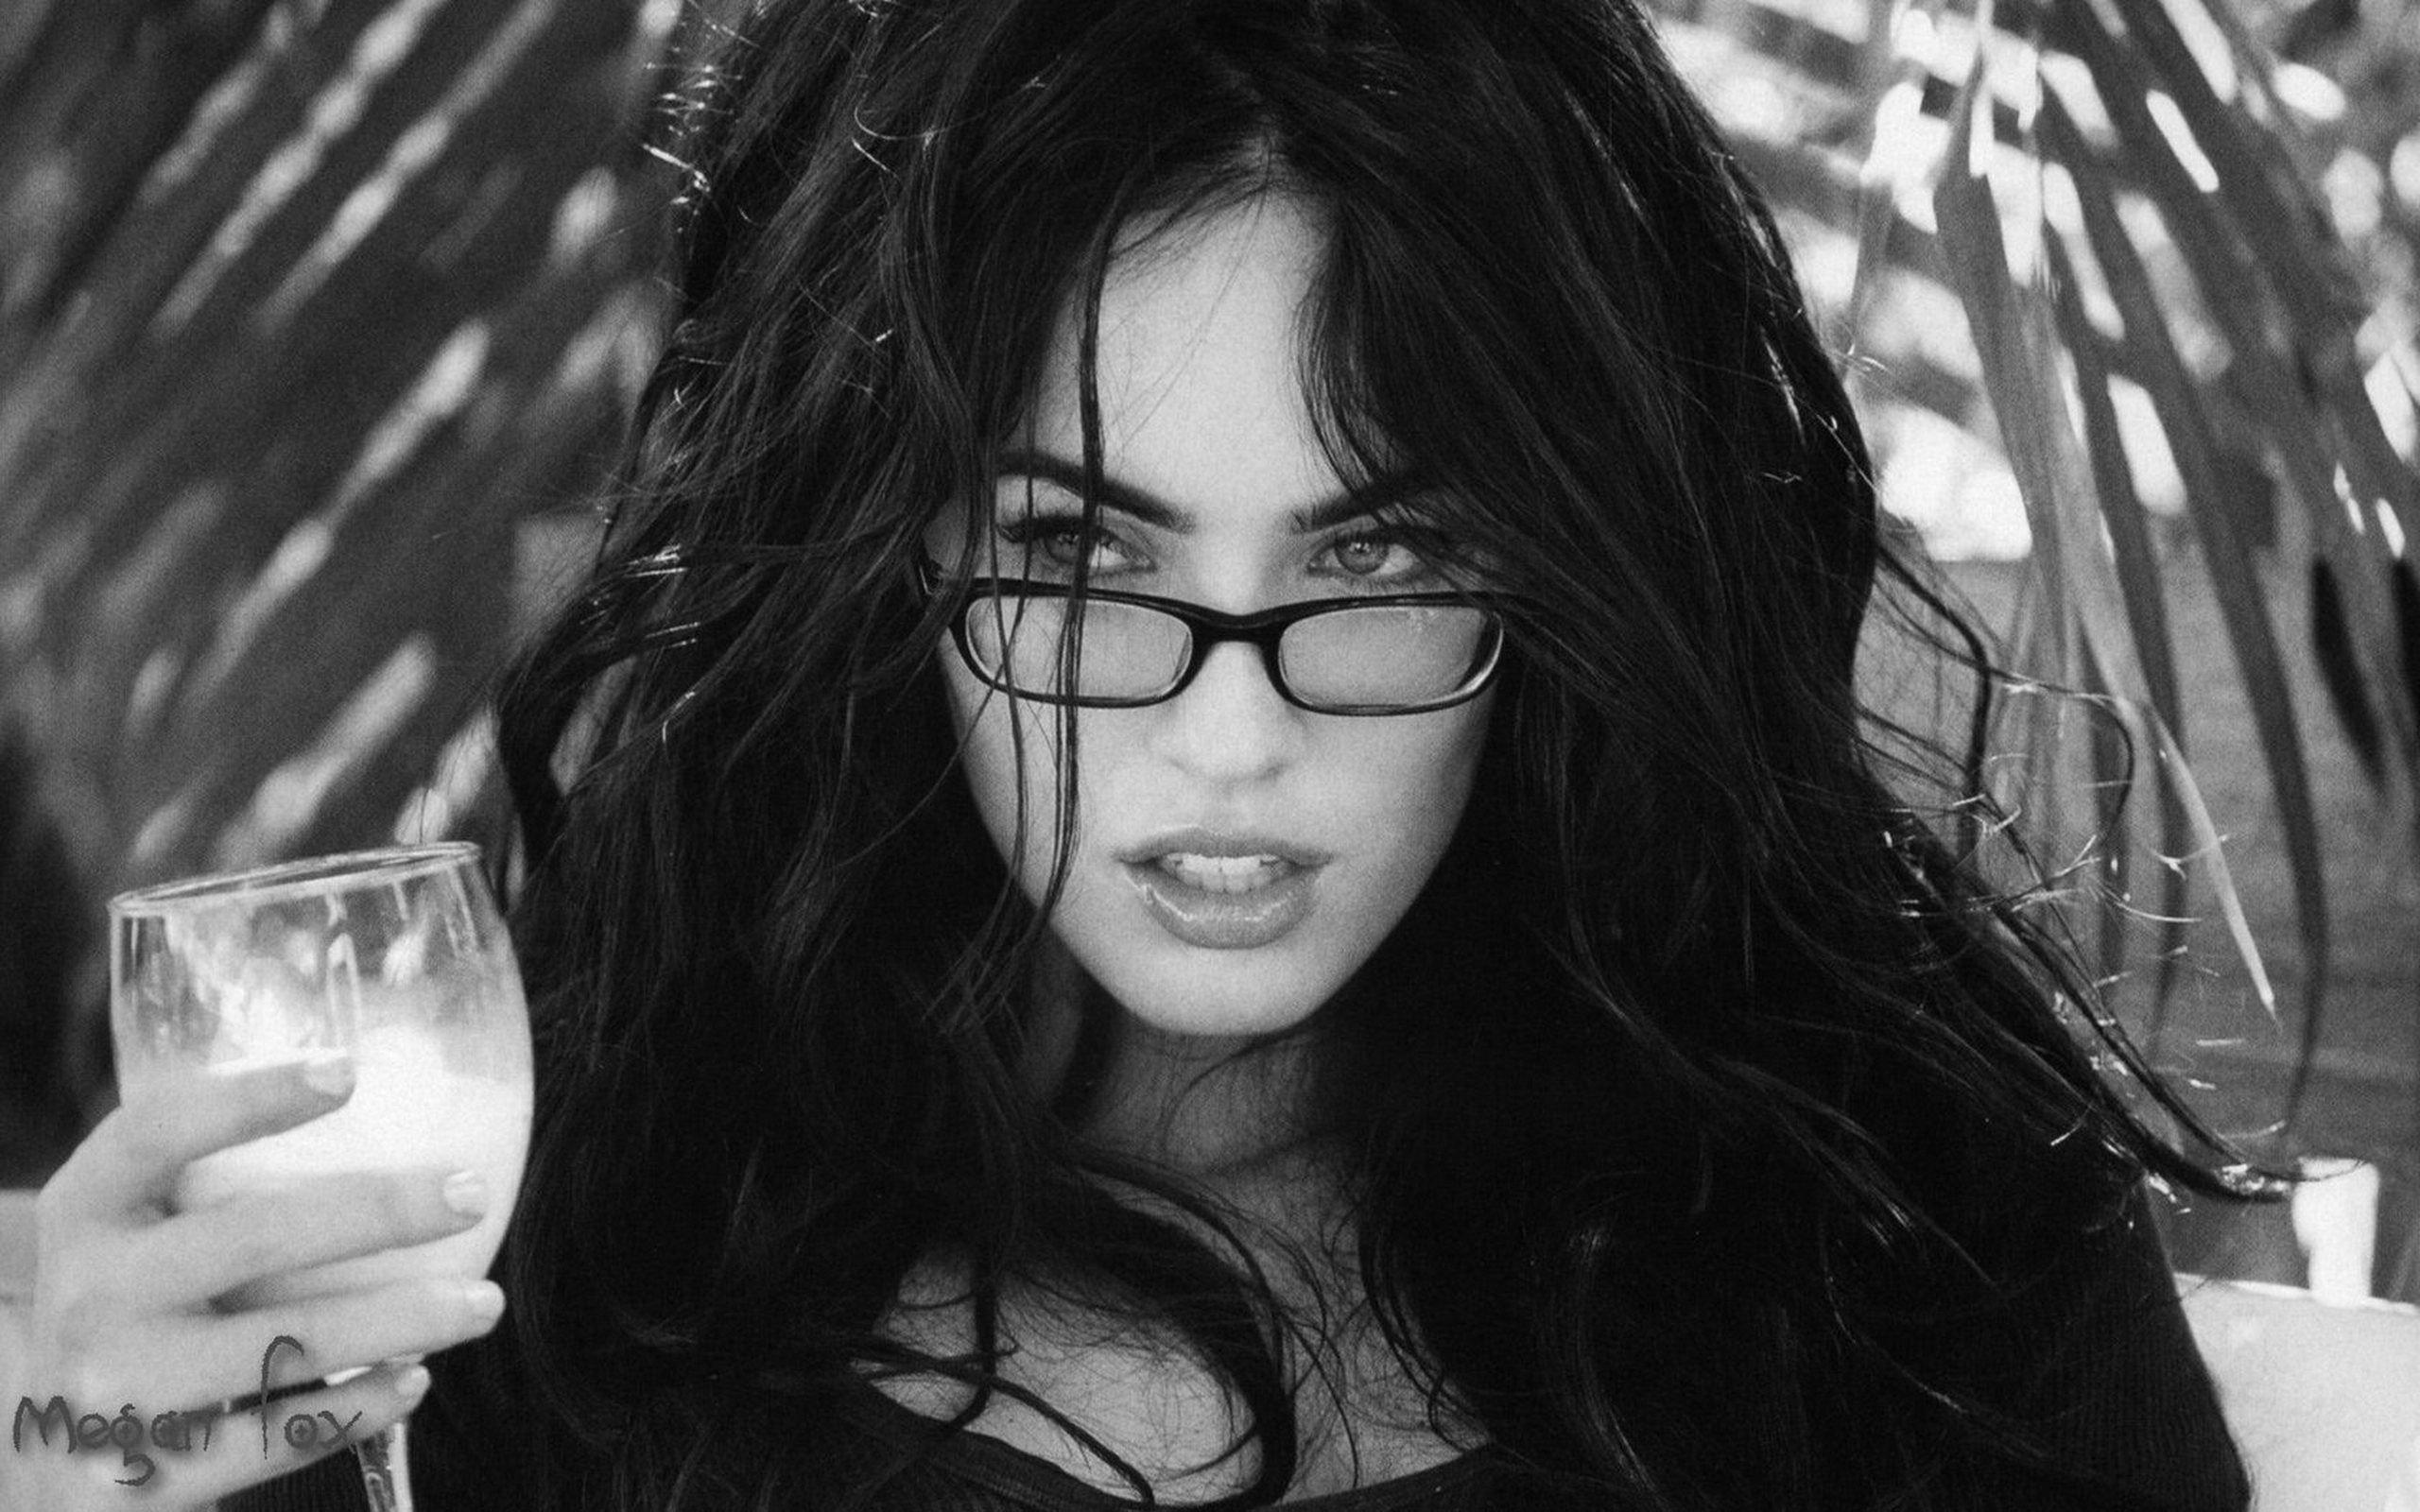 SENSUALITY - Megan Fox girl eyeglasses black end white cup ... Megan Fox Wallpaper Black And White